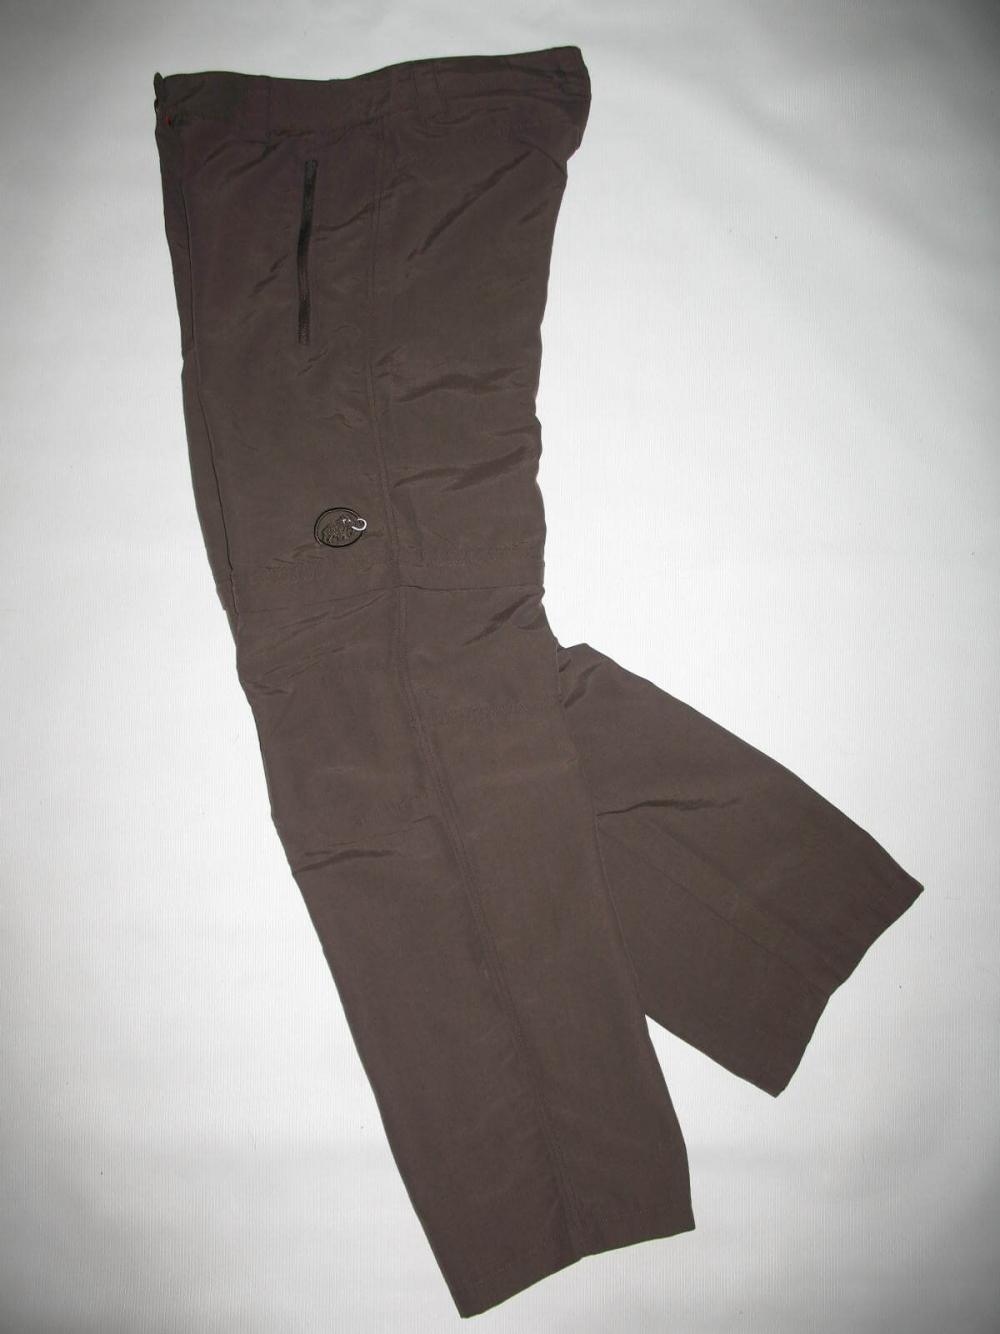 Штаны MAMMUT Zip Off brown pants lady (размер S/XS) - 3